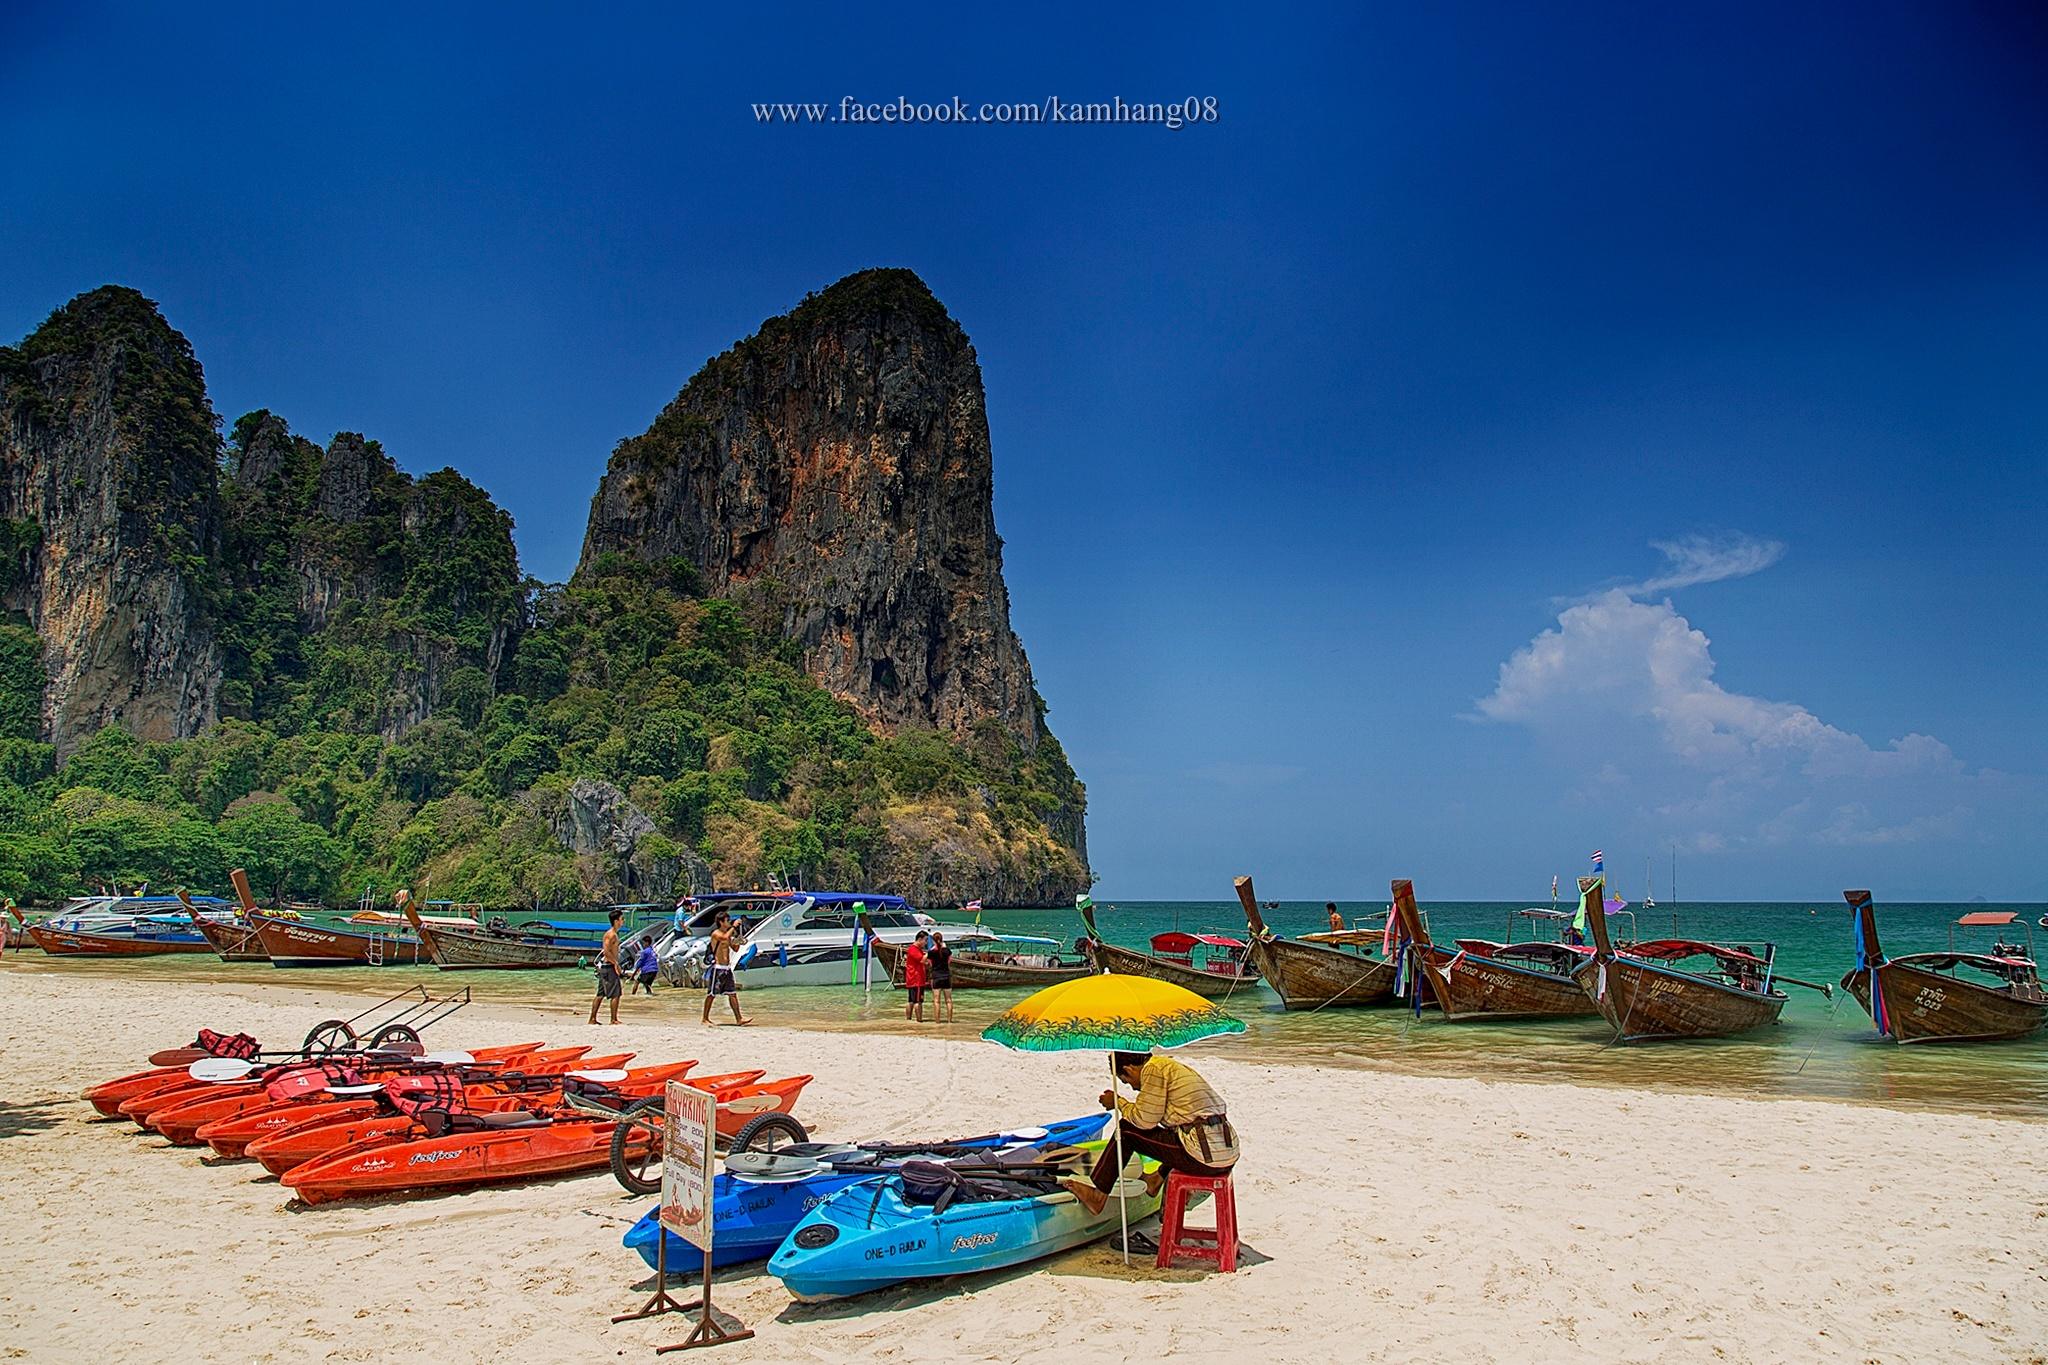 Wonderful Beach, Railay, Krabi, Thailand. by kamhang kungquang